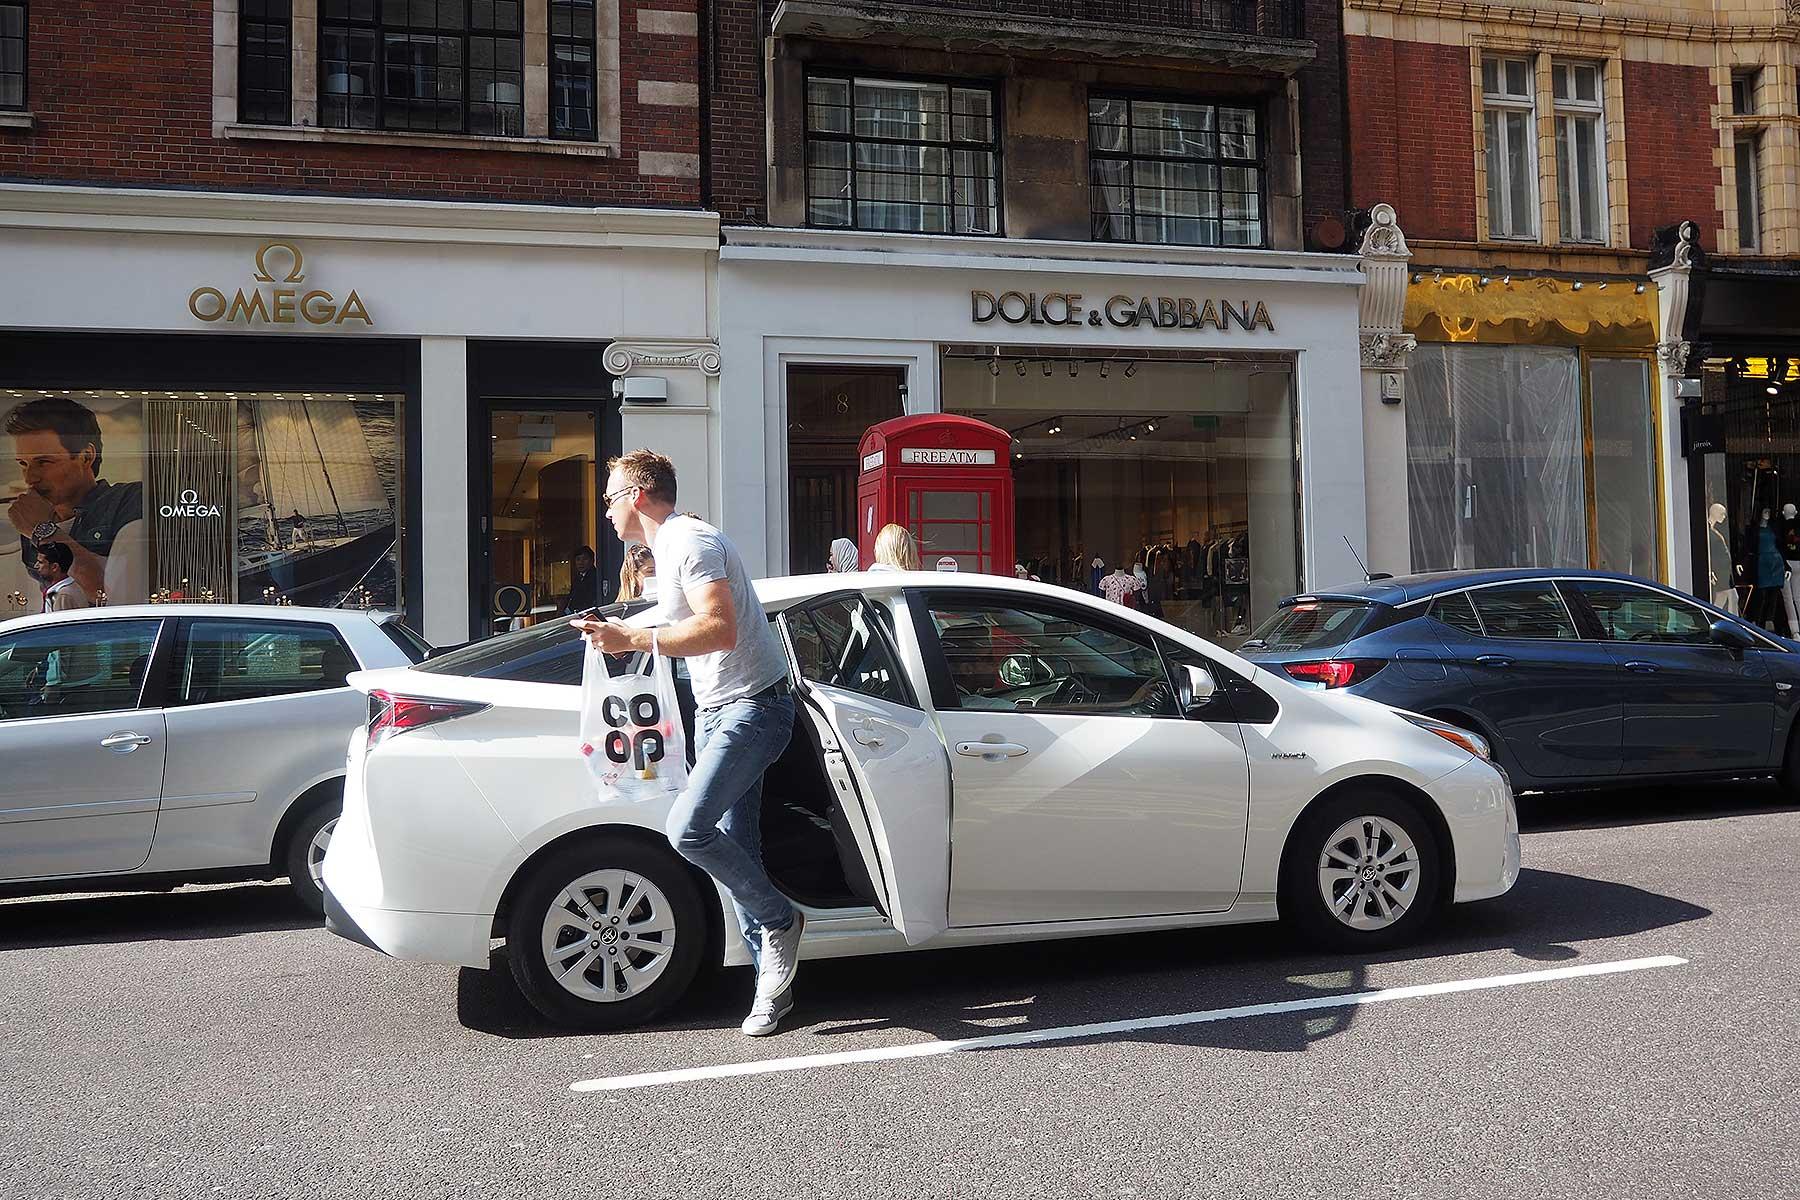 Uber rider in London